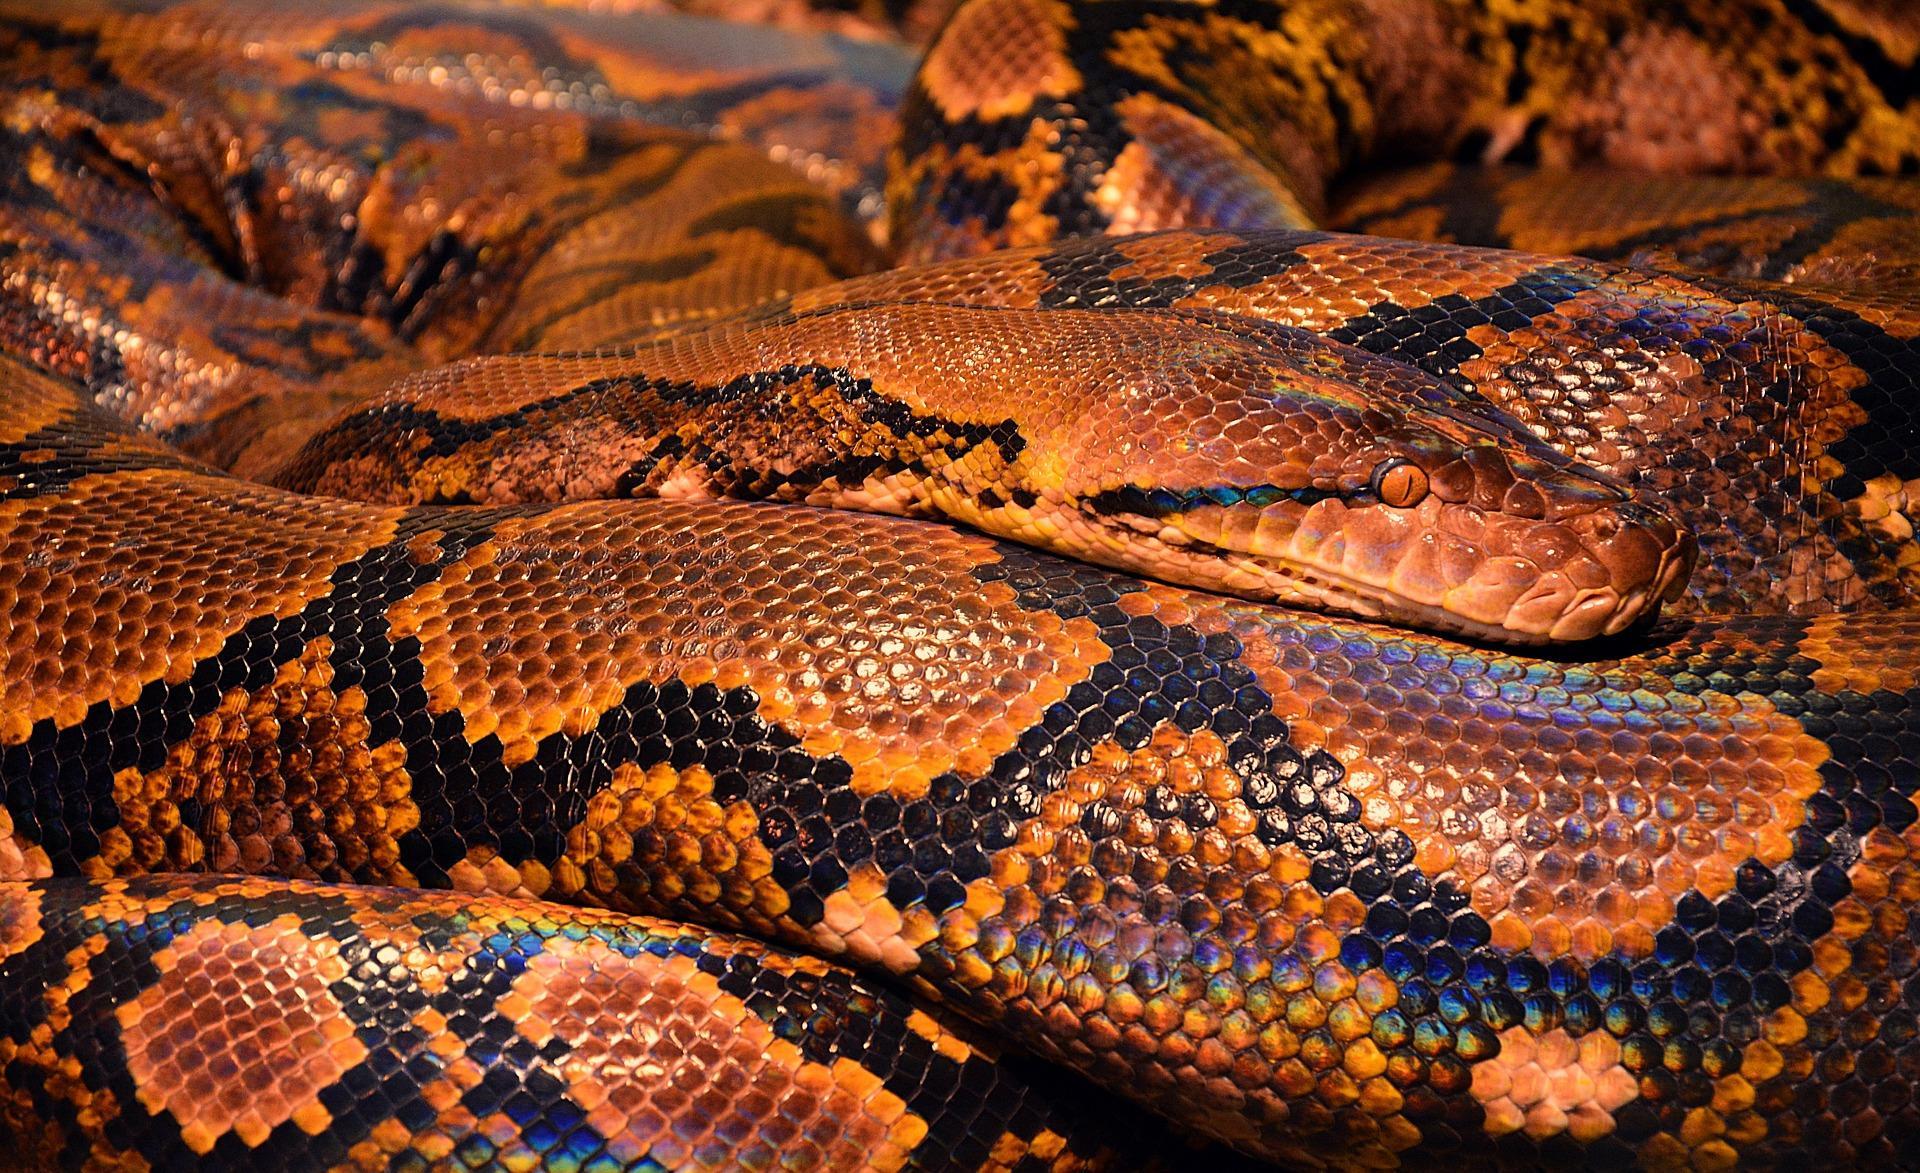 A very large snake